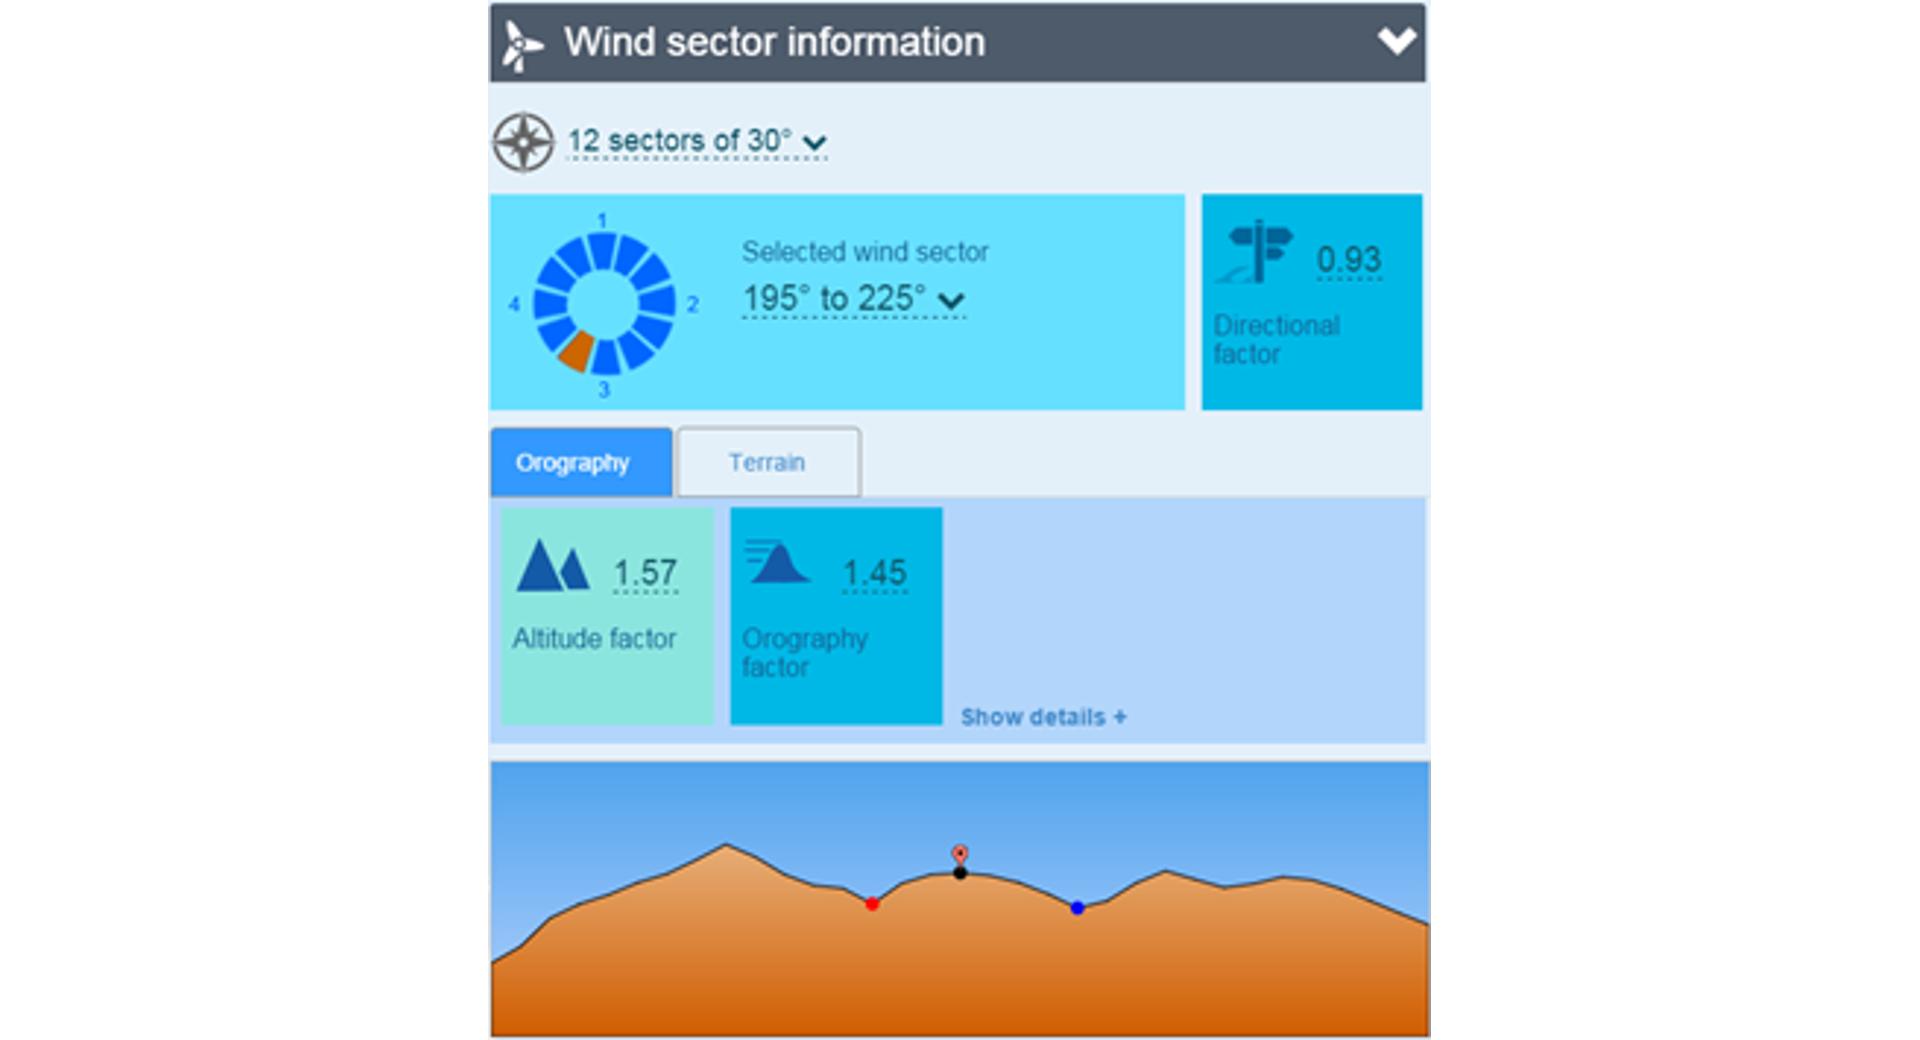 VelVenti - peak wind speed analysis